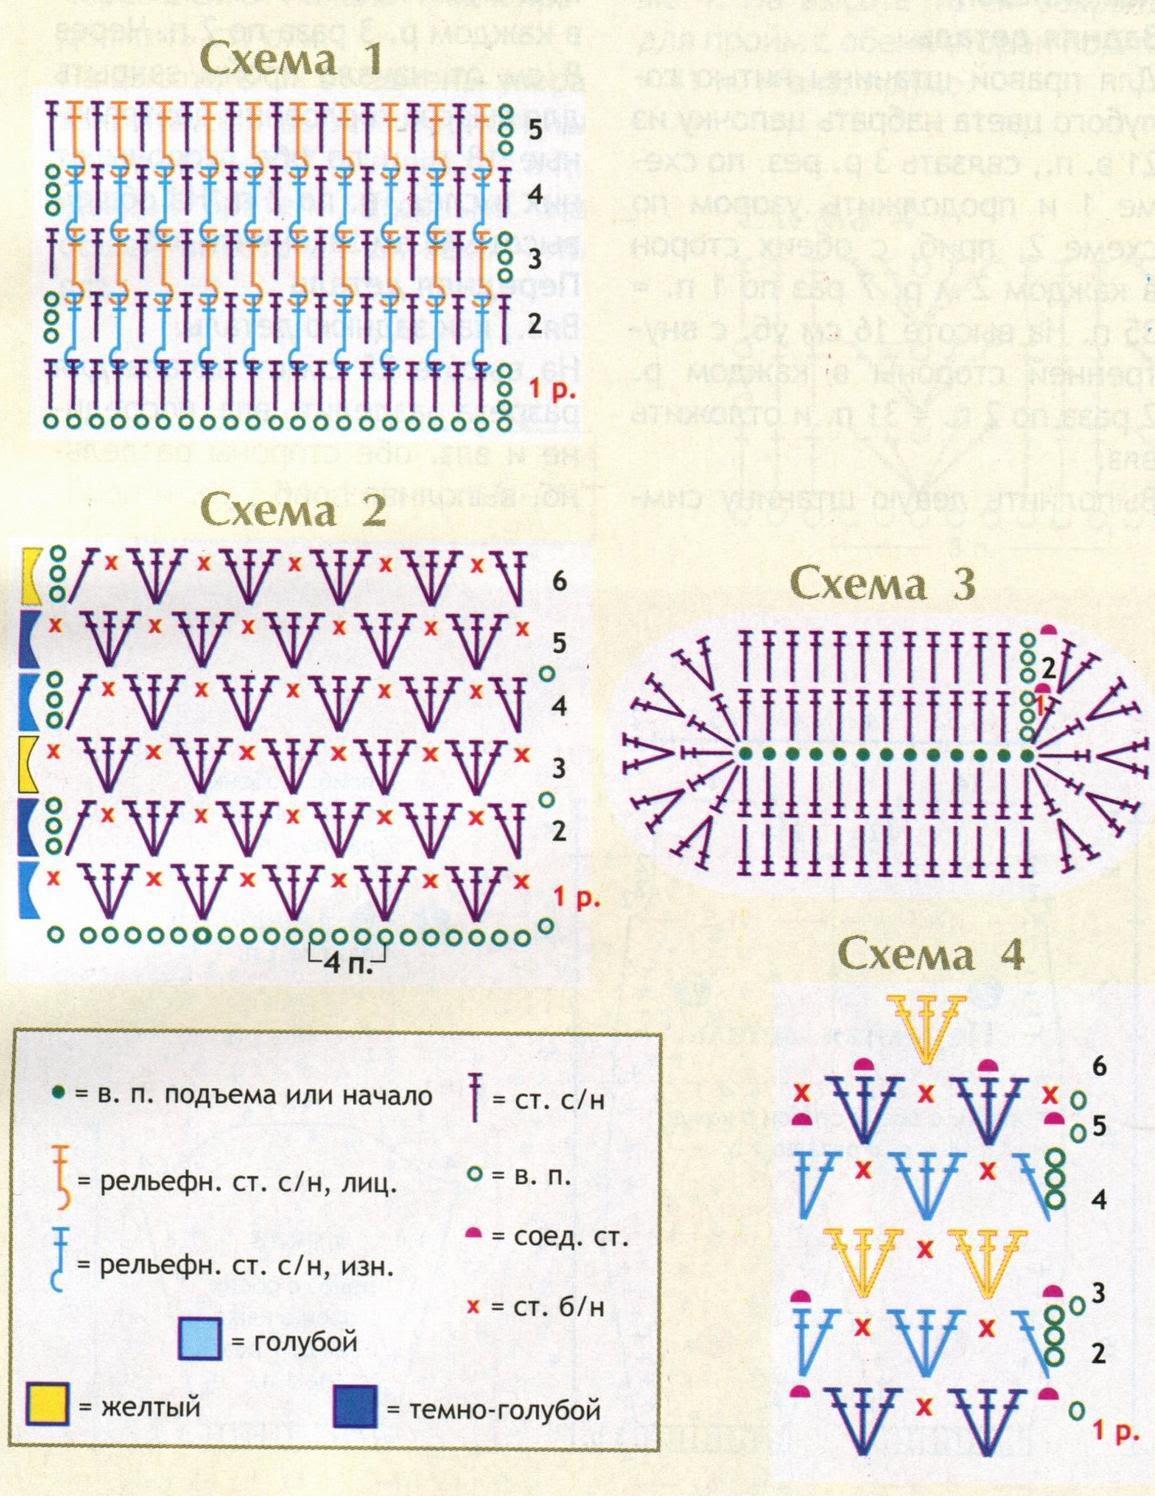 Coveralls and booties in the newborn crochet scheme